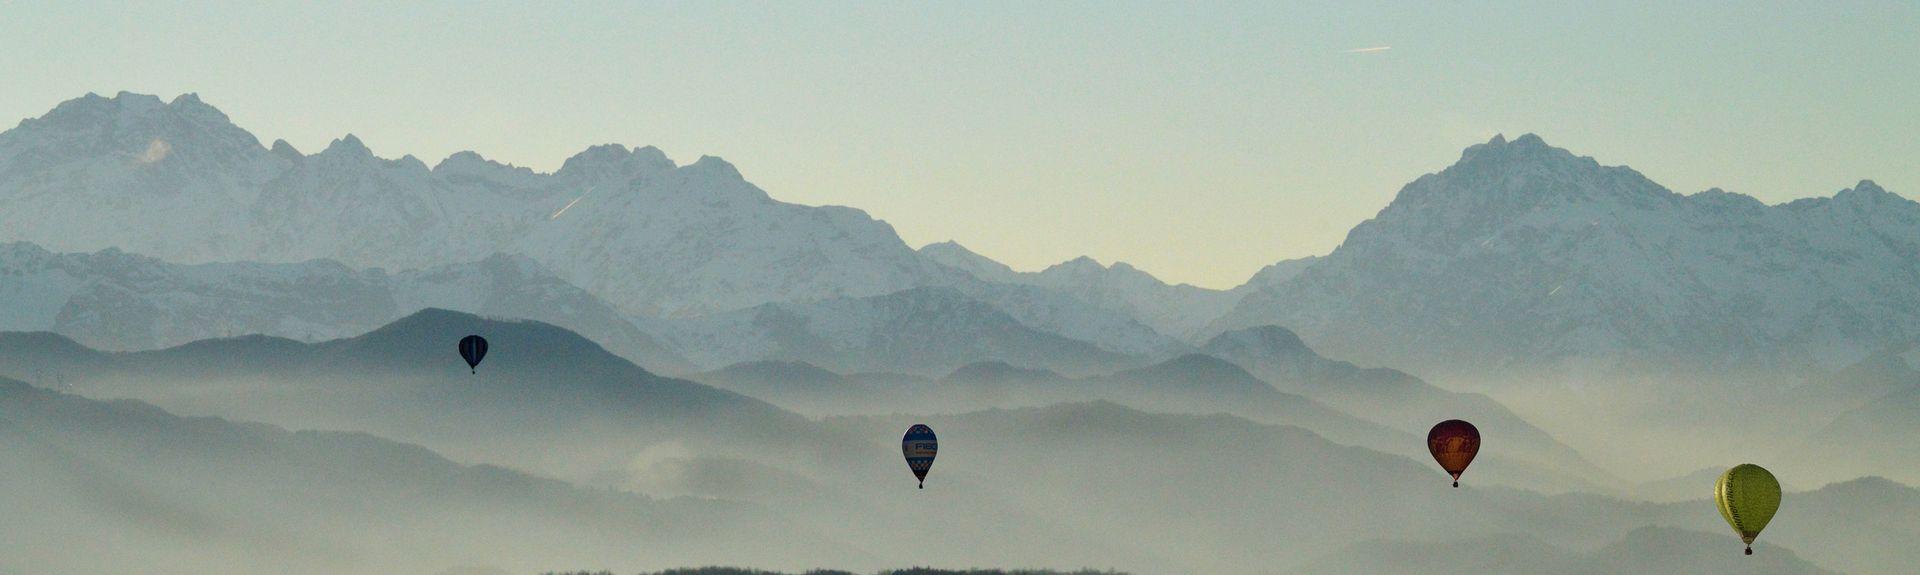 Magliolo, Ligurië, Italië